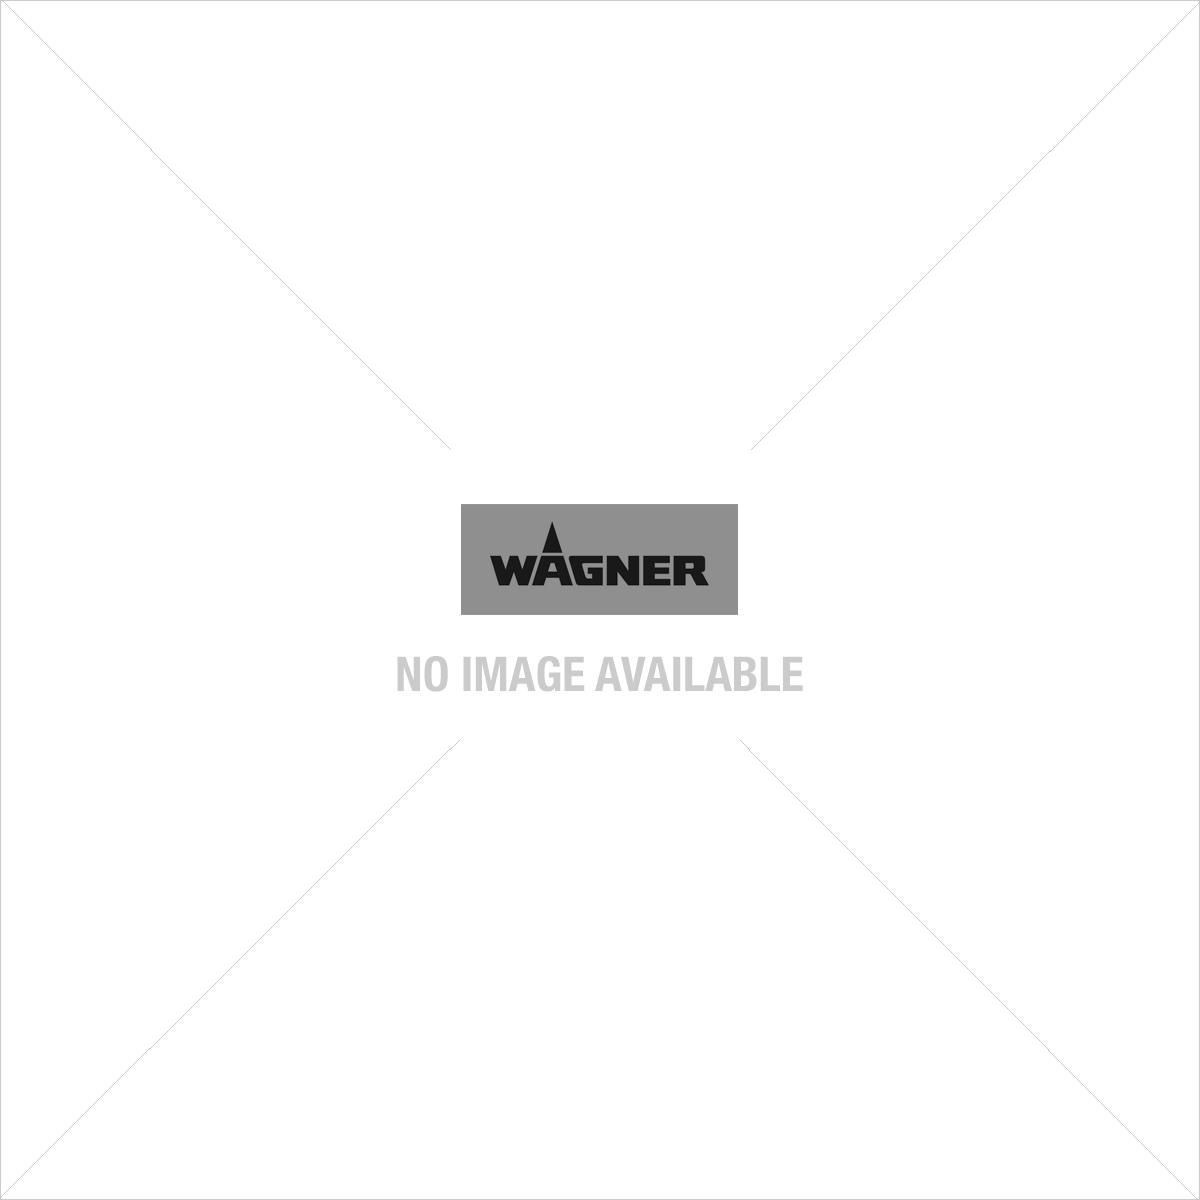 Wagner ProjectPro 119 Airless Paint Sprayer